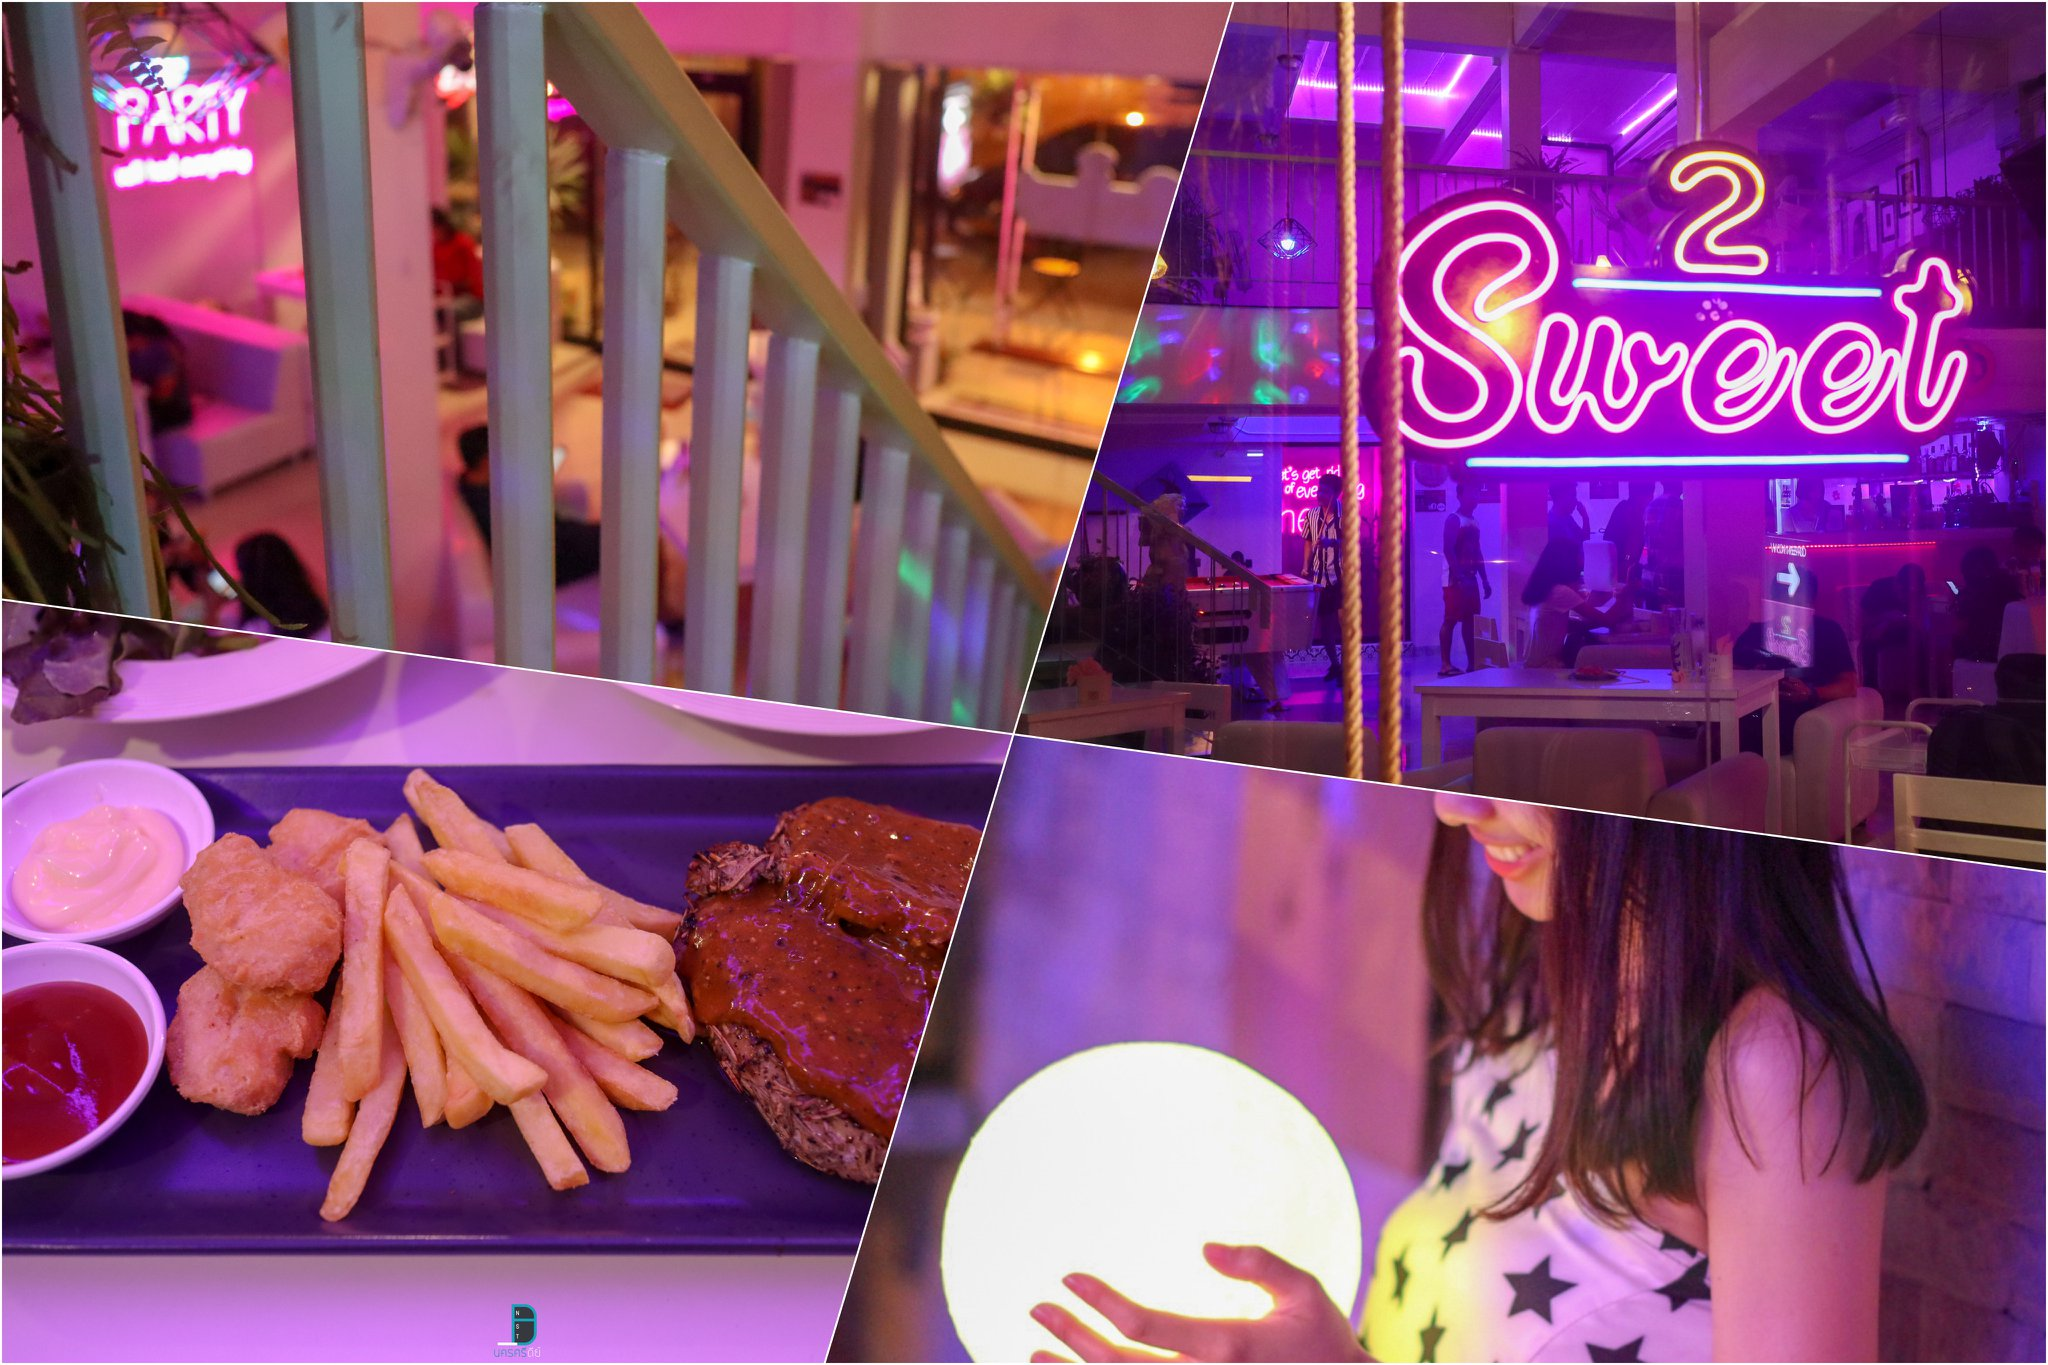 3.-2sweet-bar-cafe-กึ่งบาร์กึ่งคาเฟ่สวยๆ-พร้อมจุดถ่ายรูปแสงสีเด็ดมากมาย-ดูรีวิวตัวเต็มได้ที่-รายละเอียด-คลิก แหล่งท่องเที่ยว,นครศรี,จุดเช็คอิน,จุดถ่ายรูป,คาเฟ่,ของกิน,จุดกิน